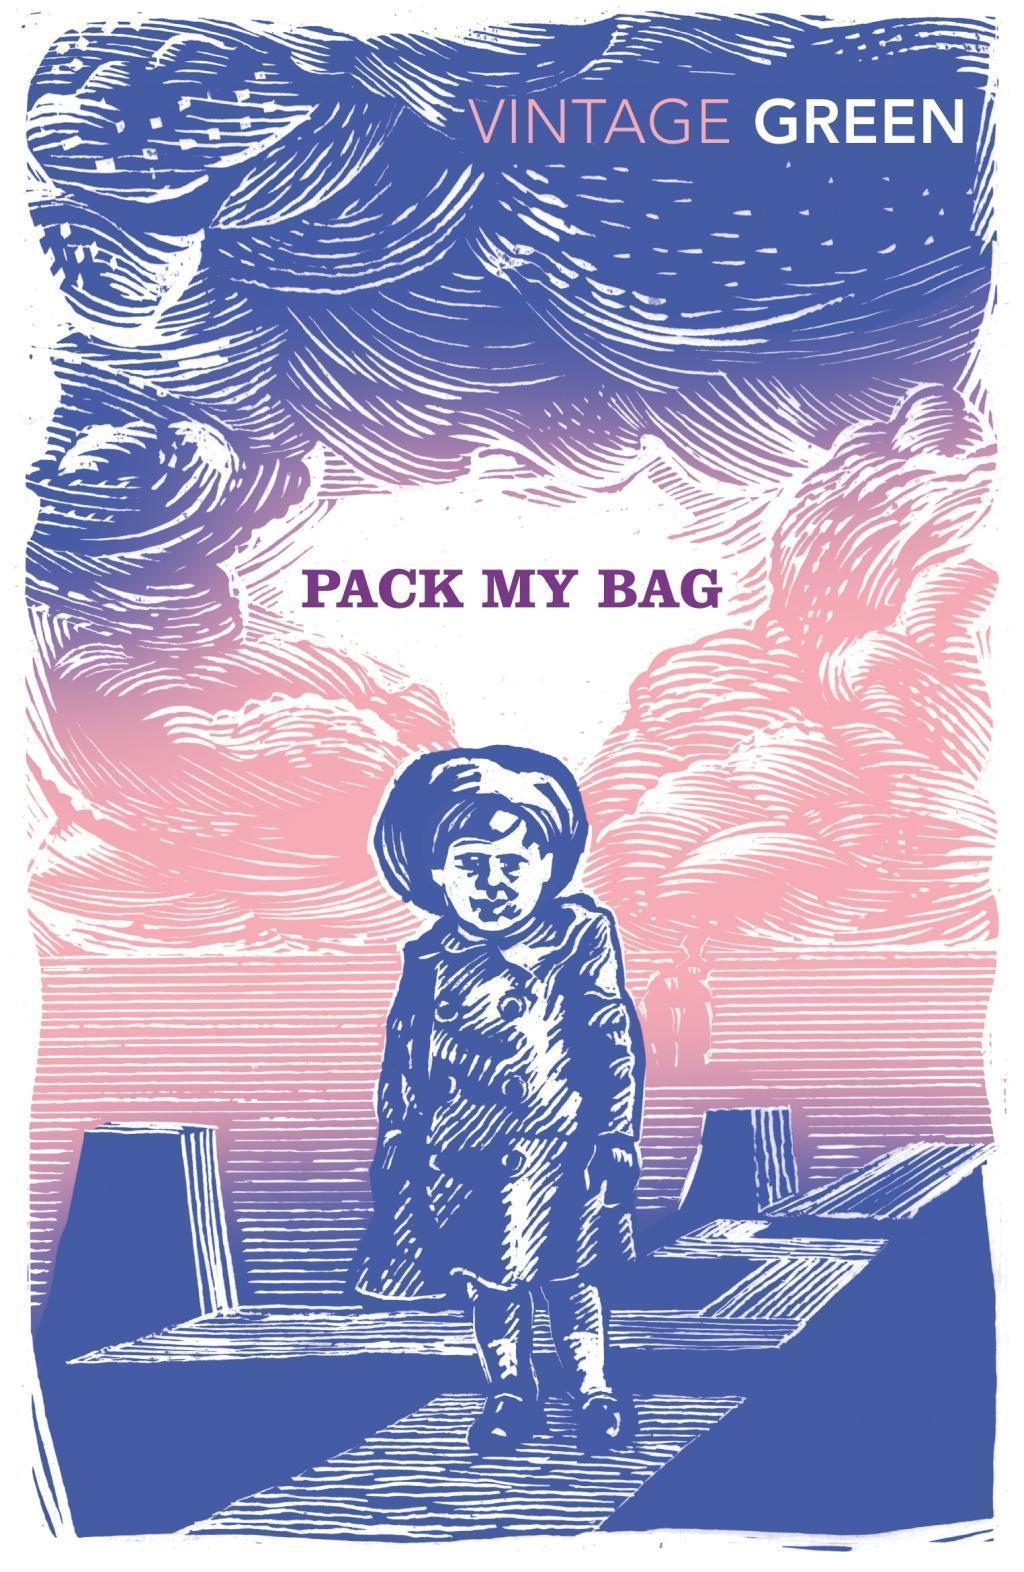 Pack My Bag